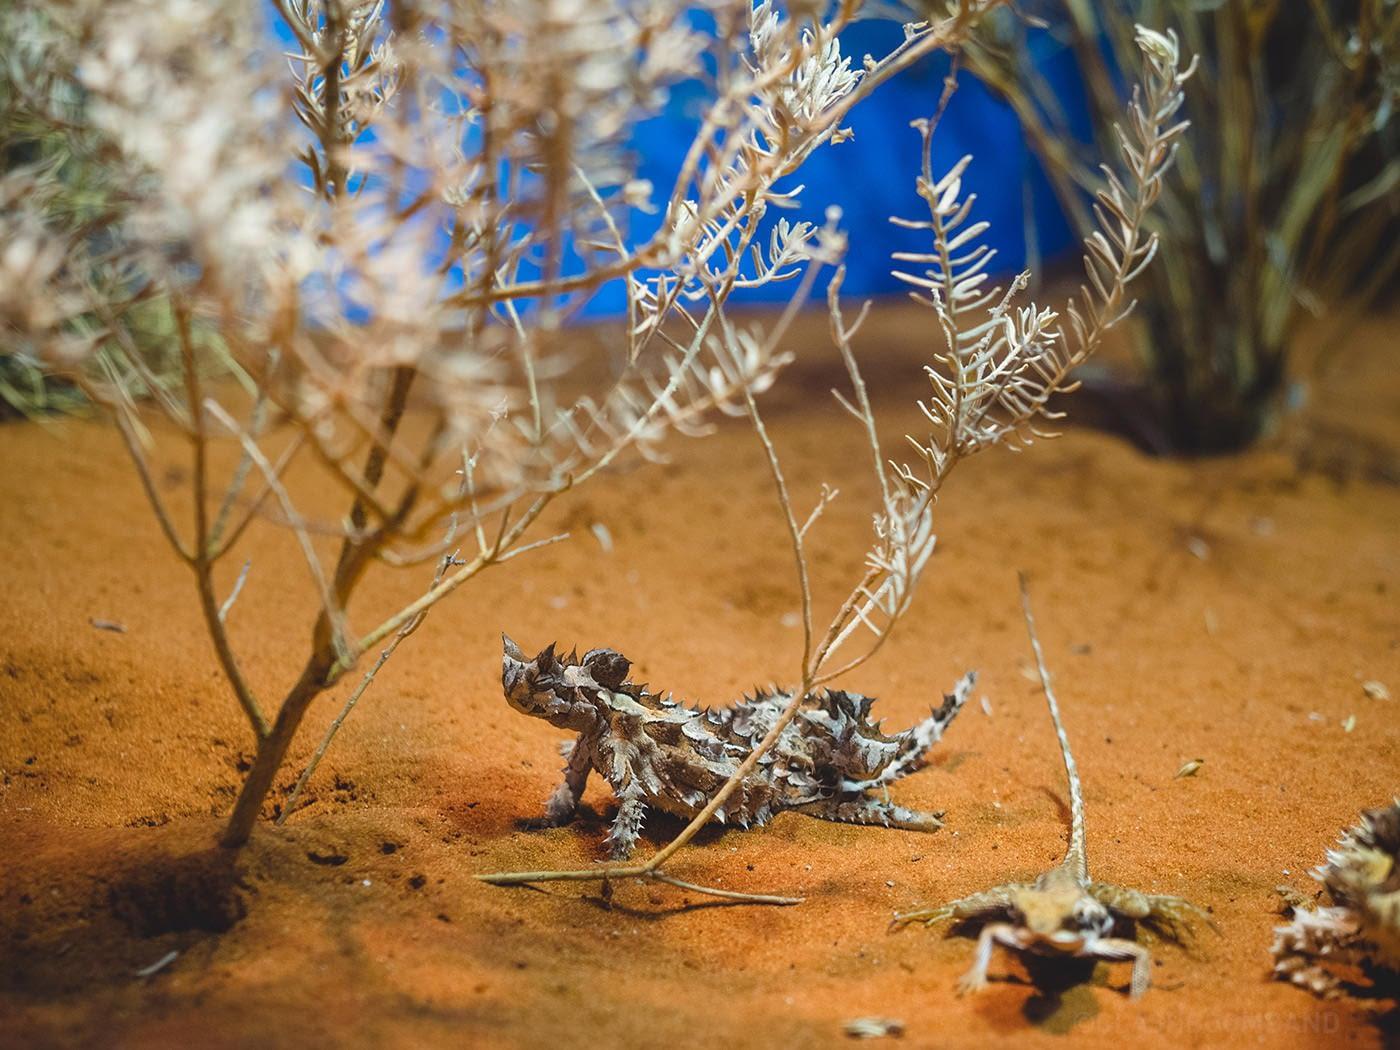 NT Australia - Thorny devil hiding out